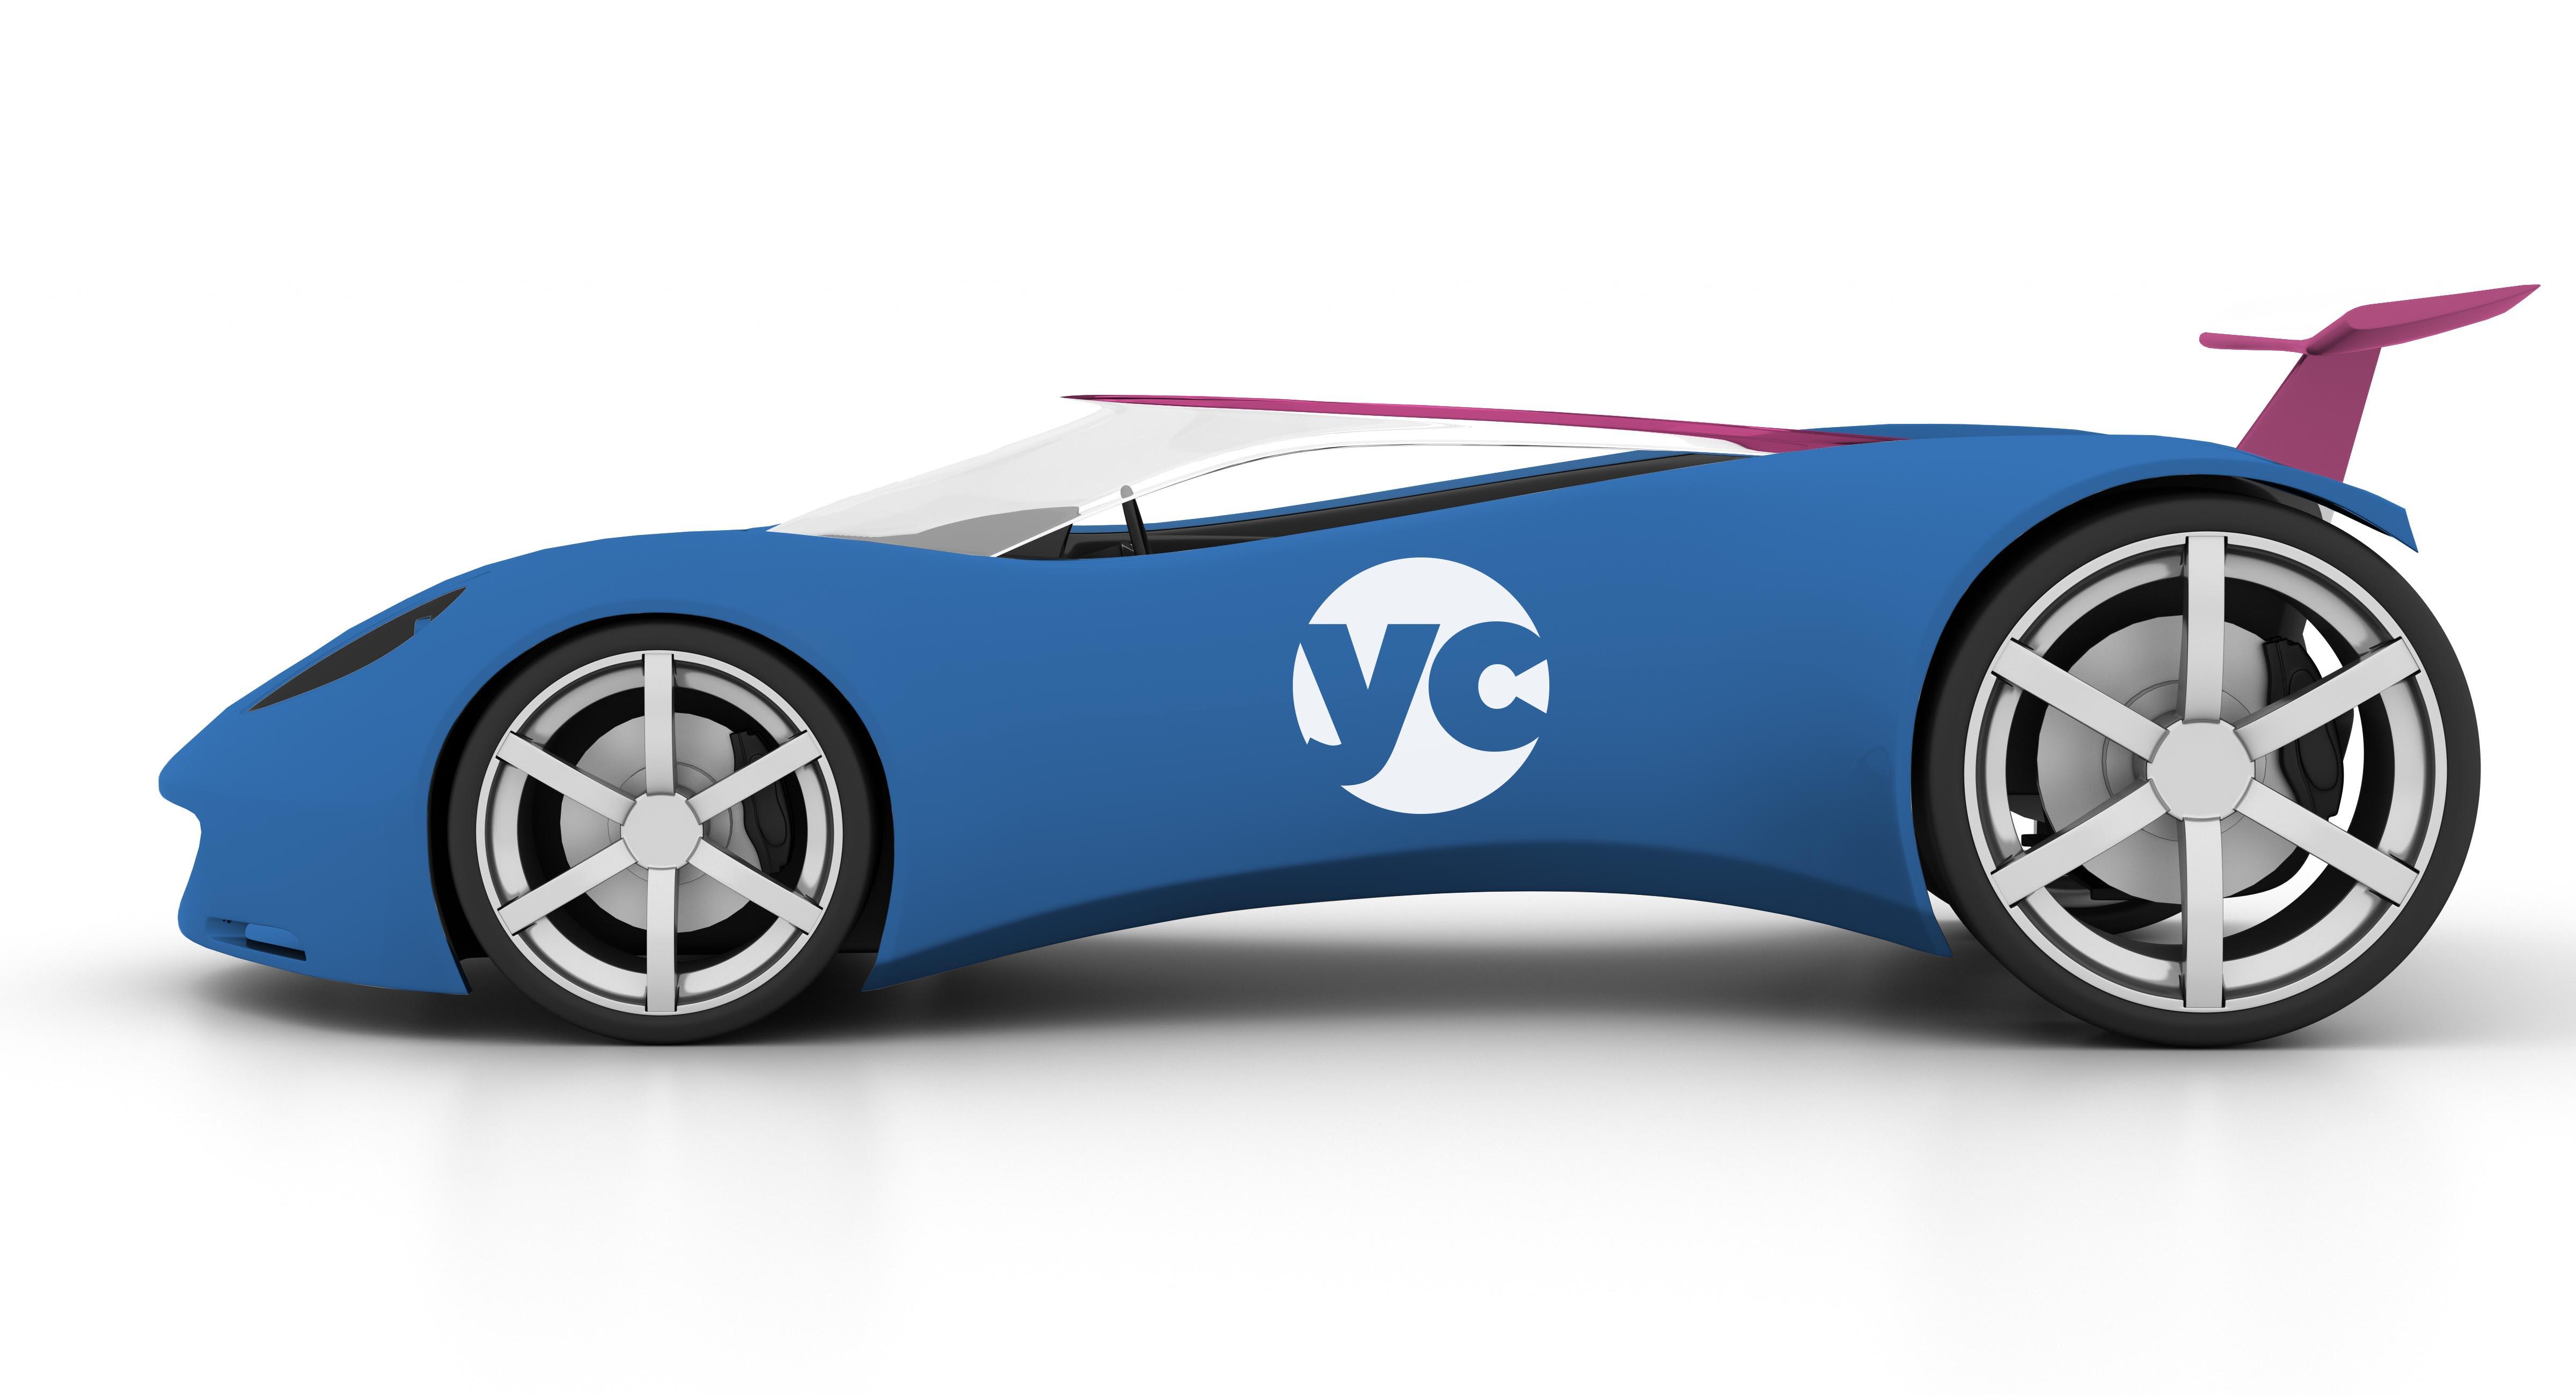 Yallacompare to Build the Fully Autonomous 'yallacar'